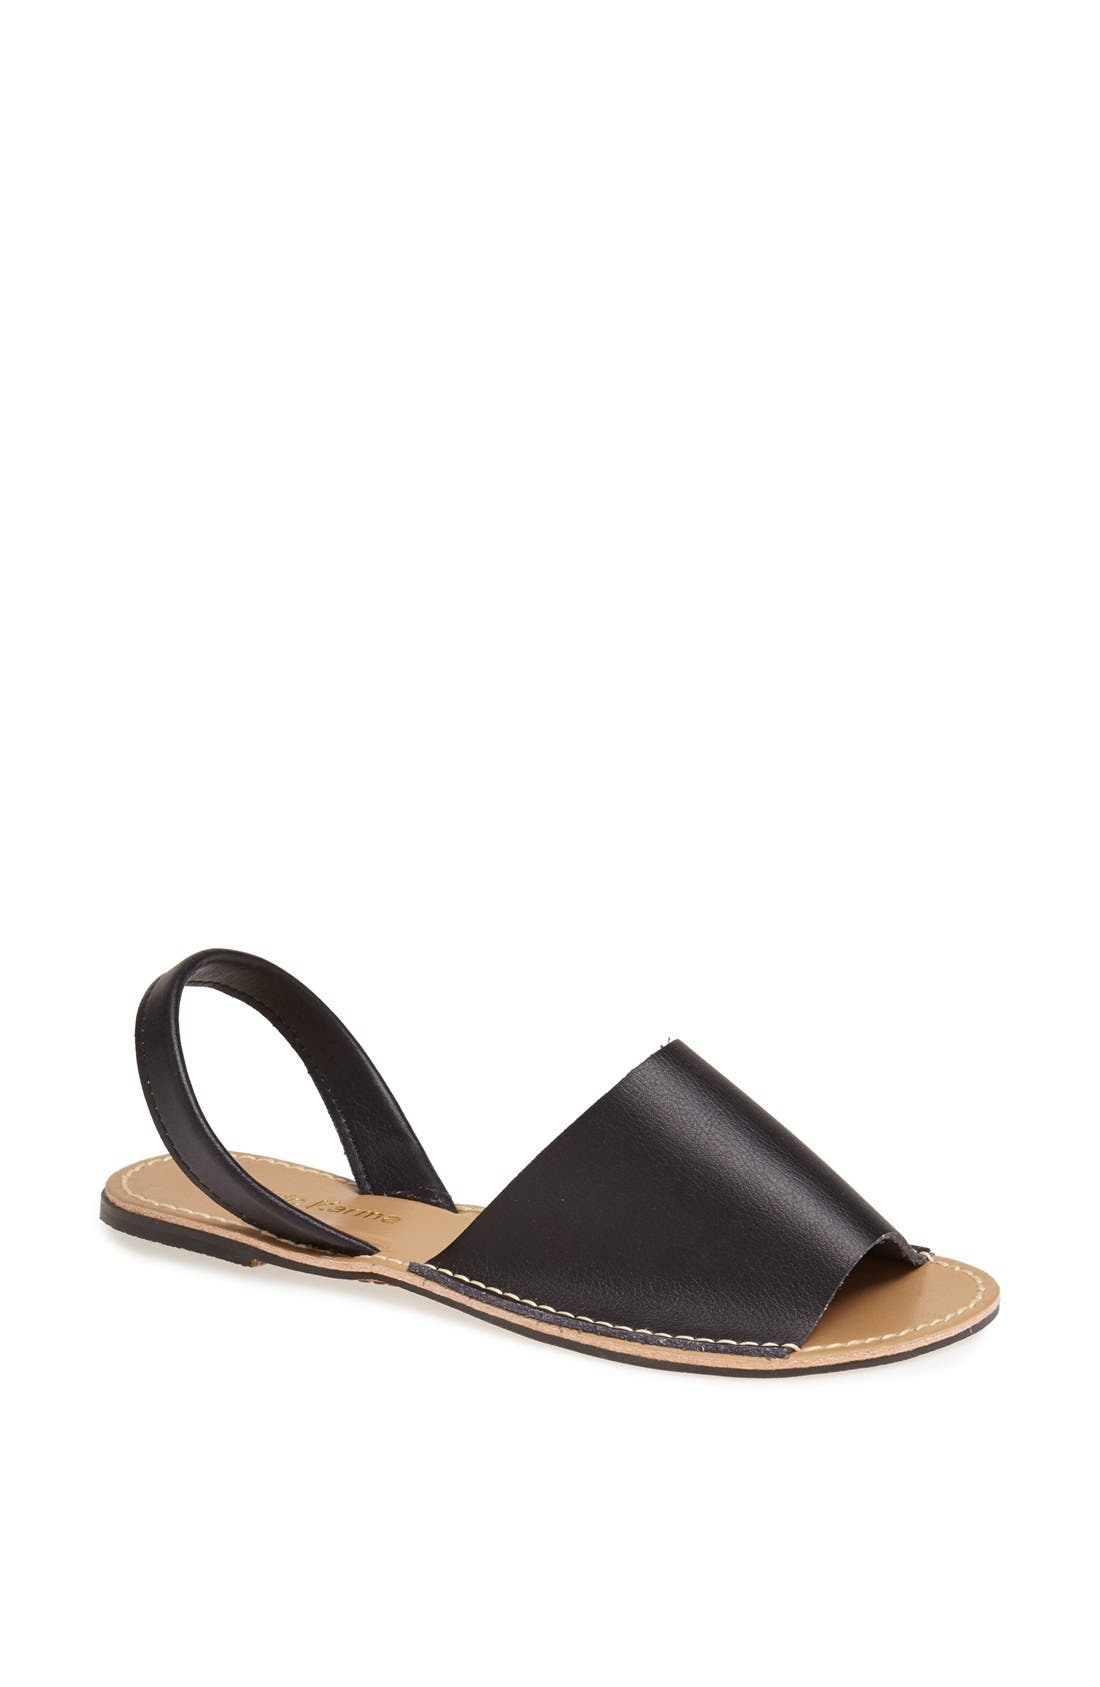 'Barca' Sandal, Main, color, 001